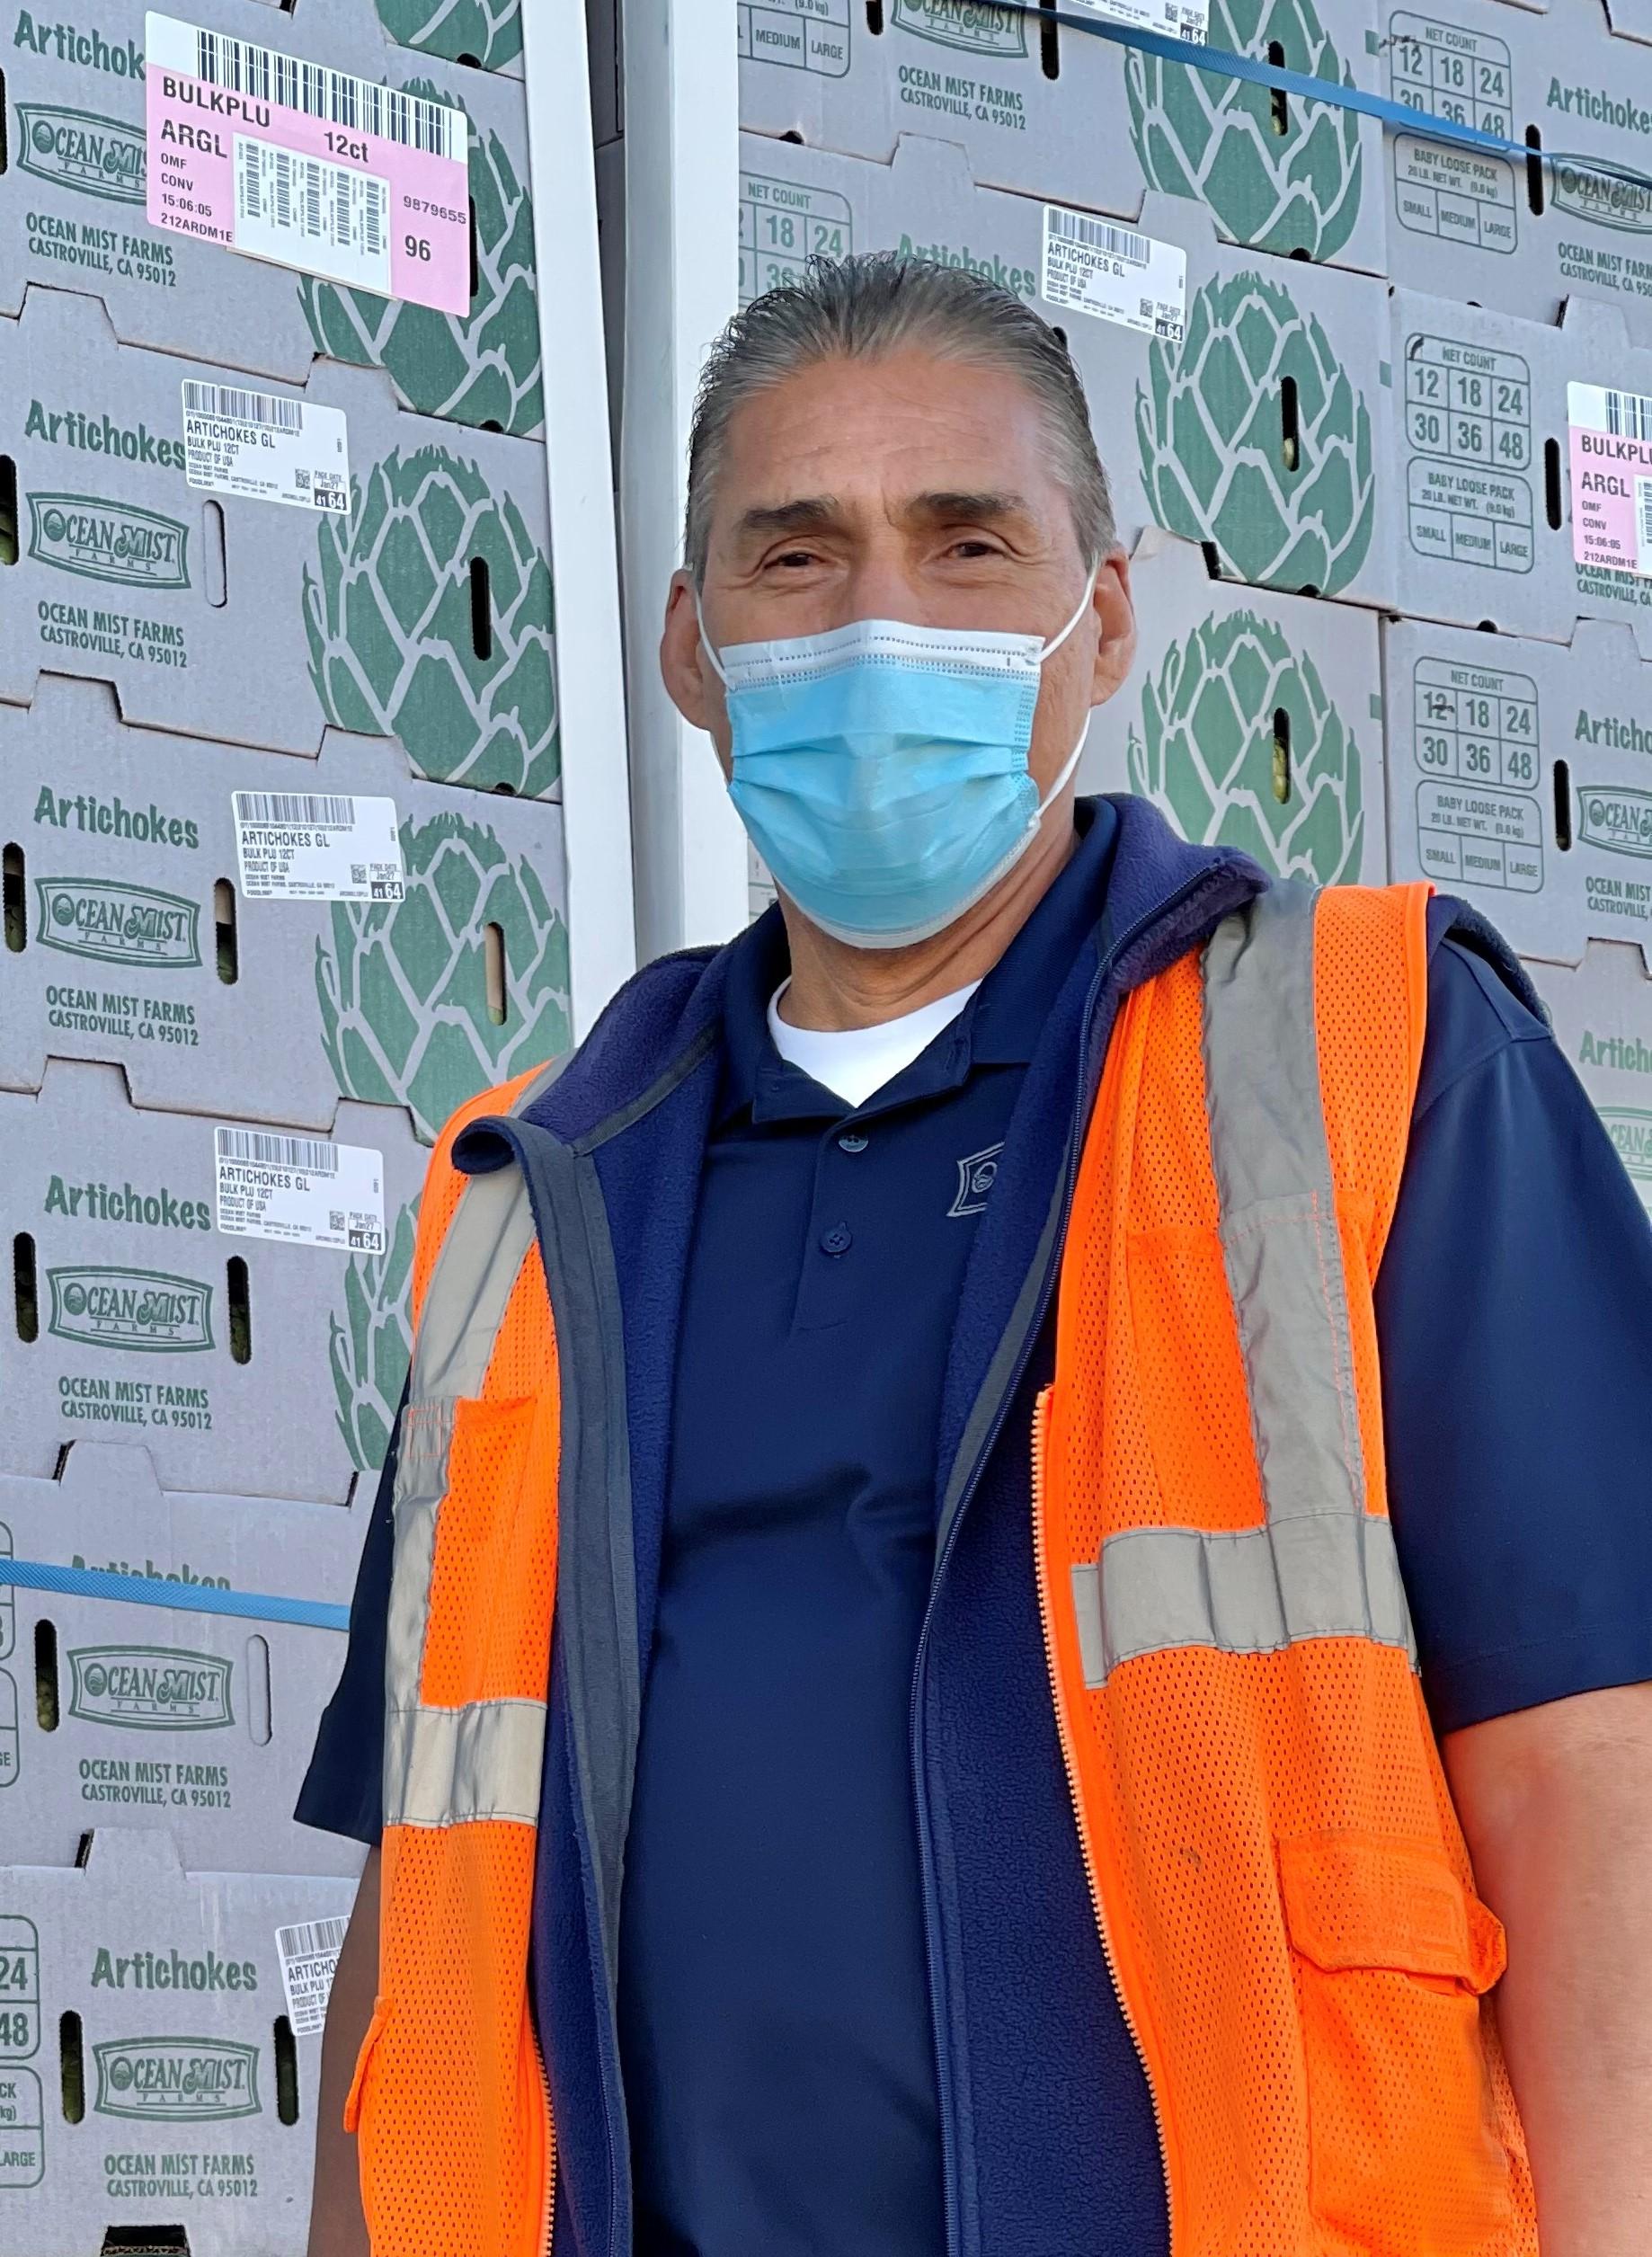 Danny-Martinez-Coachella-Plant-Manager